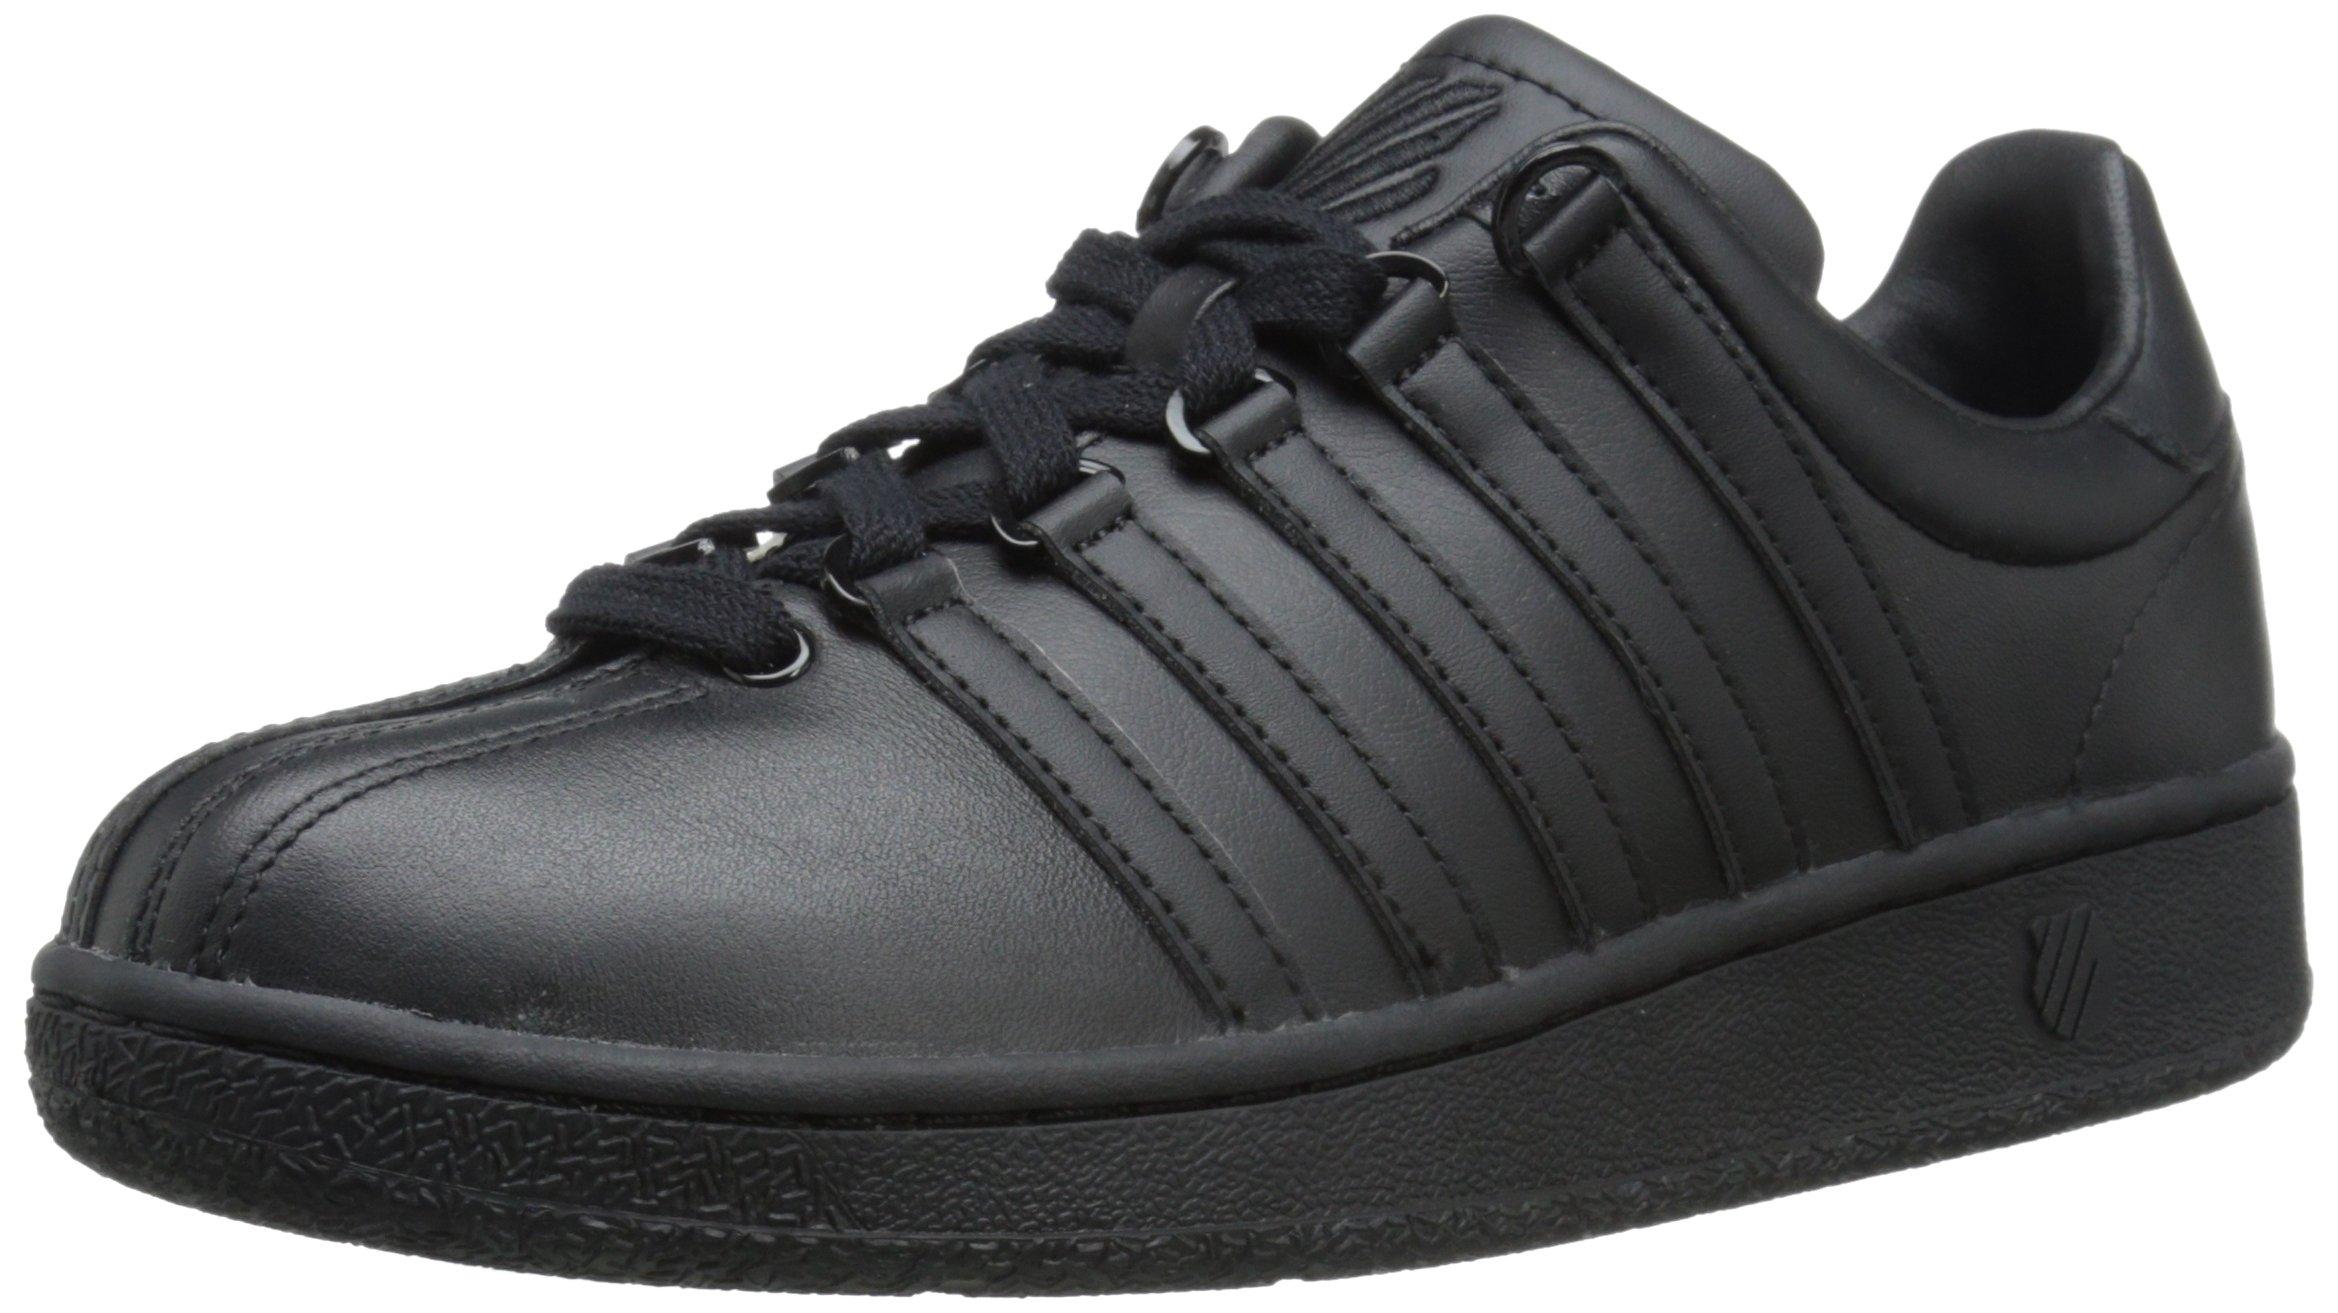 Basses 1 VnSneakers swiss Classic 2 Eu K FemmeNoirblack black39 dsChtQr